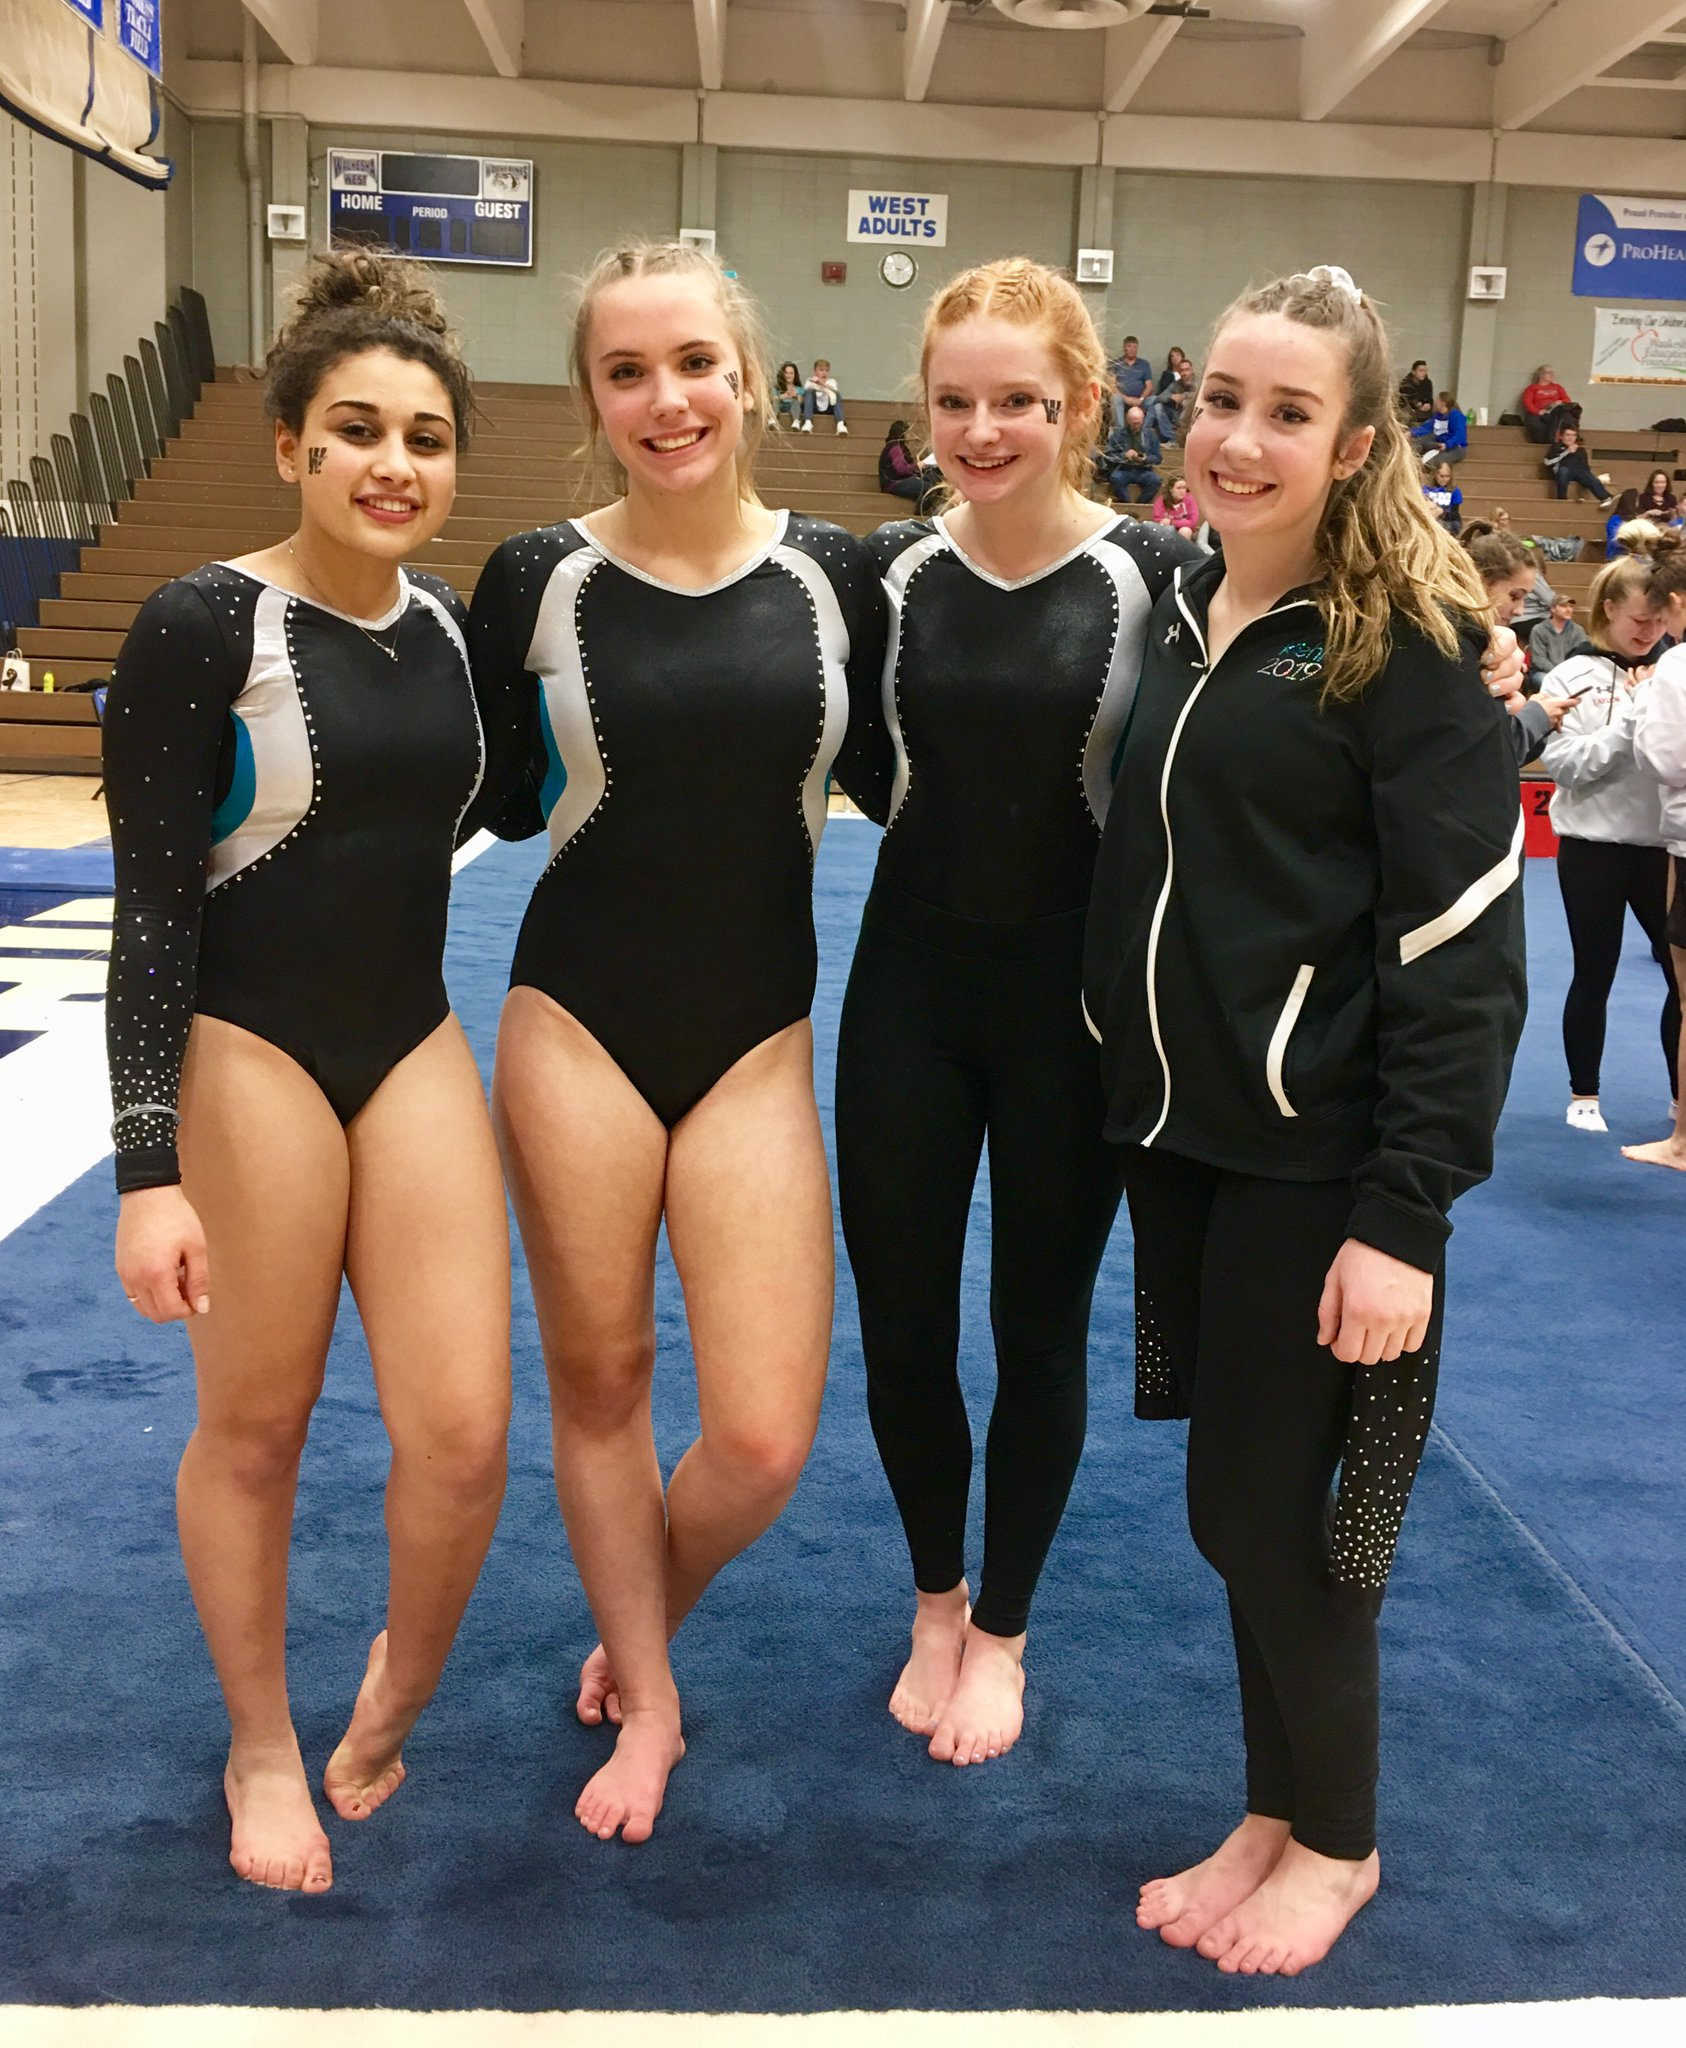 South Gymnasts